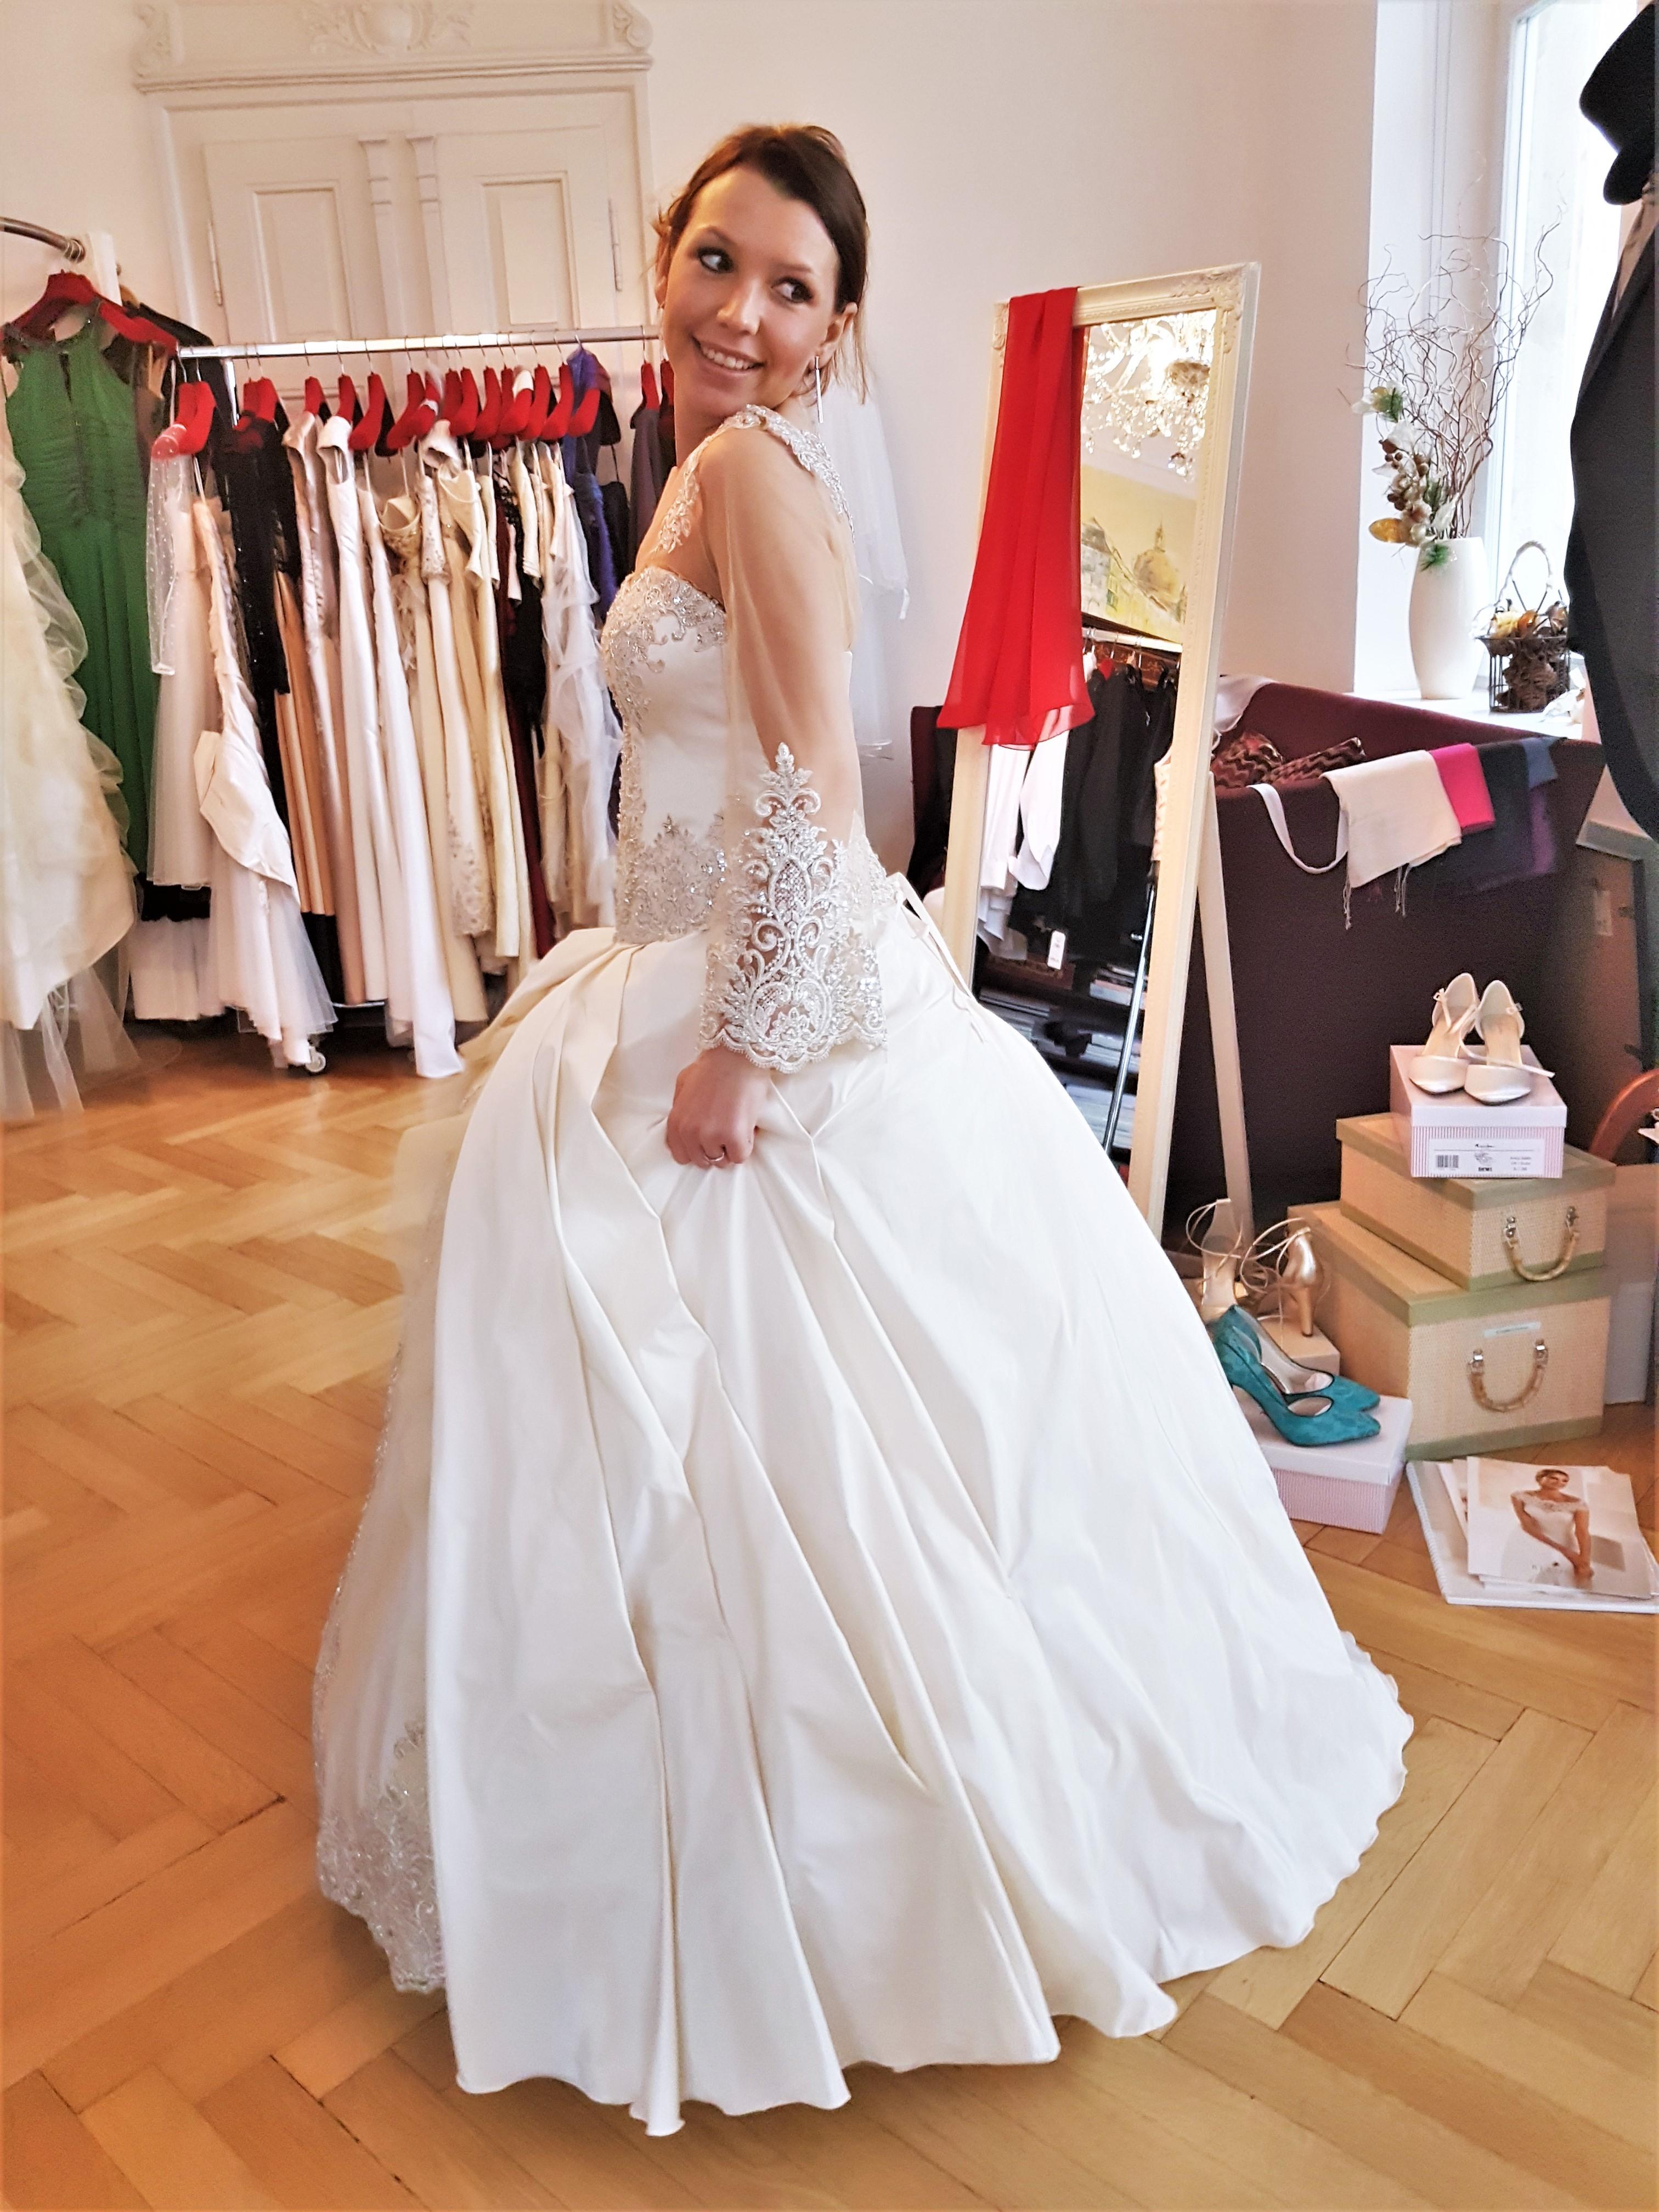 Myrelle Couture Marina Deynega Brautmode Hochzeit Anzug Massgeschneidert Story Cm 05